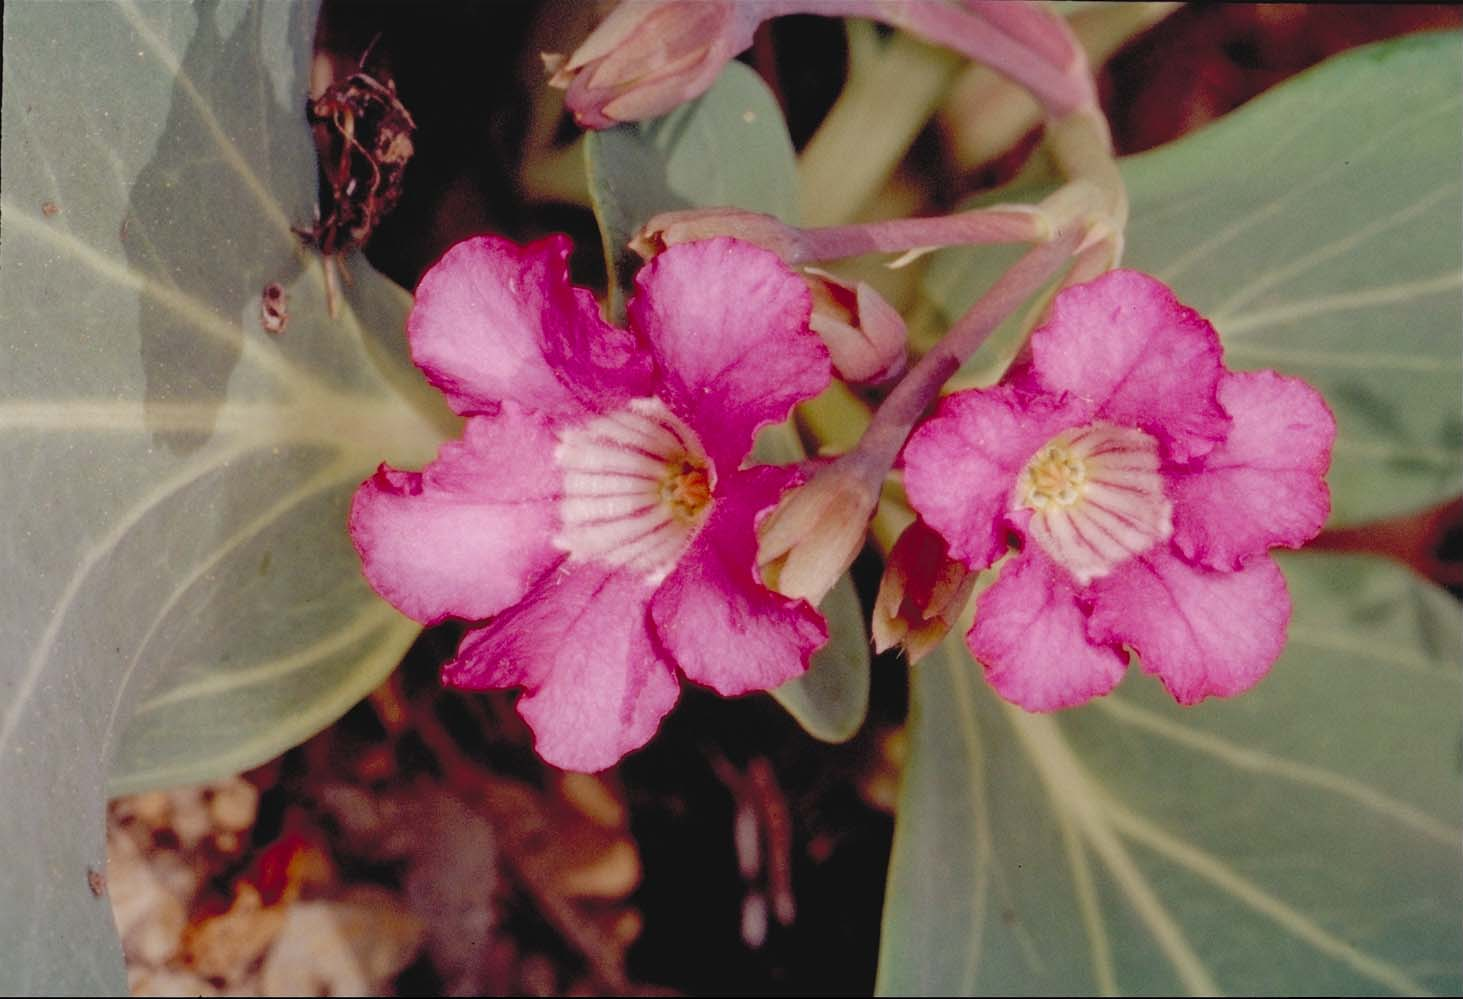 Cycladenia humilis var. humilis